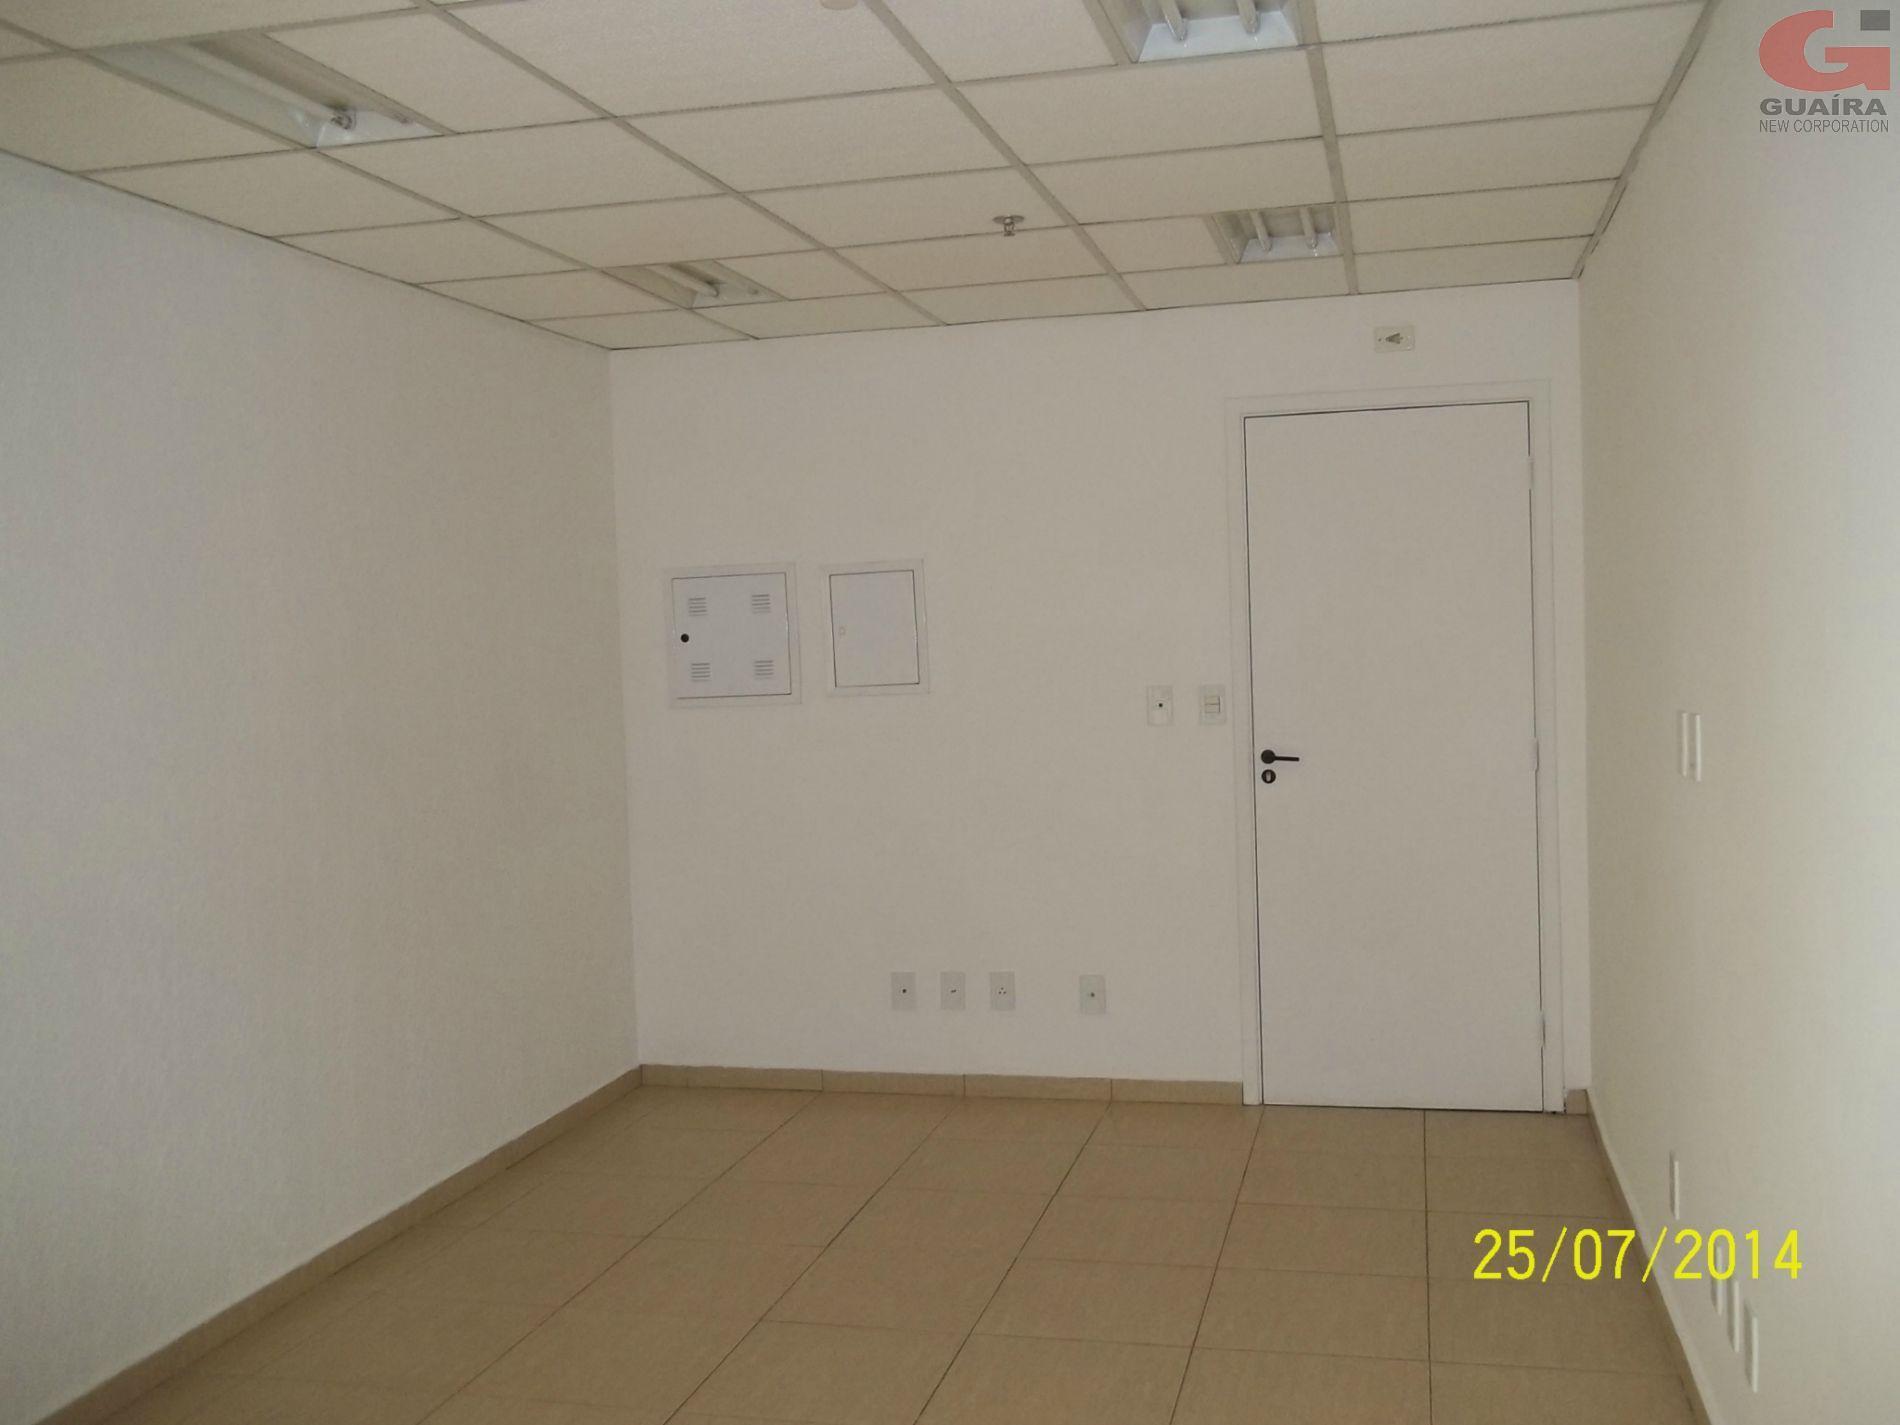 Sala à venda em Jardim Stella, Santo André - SP